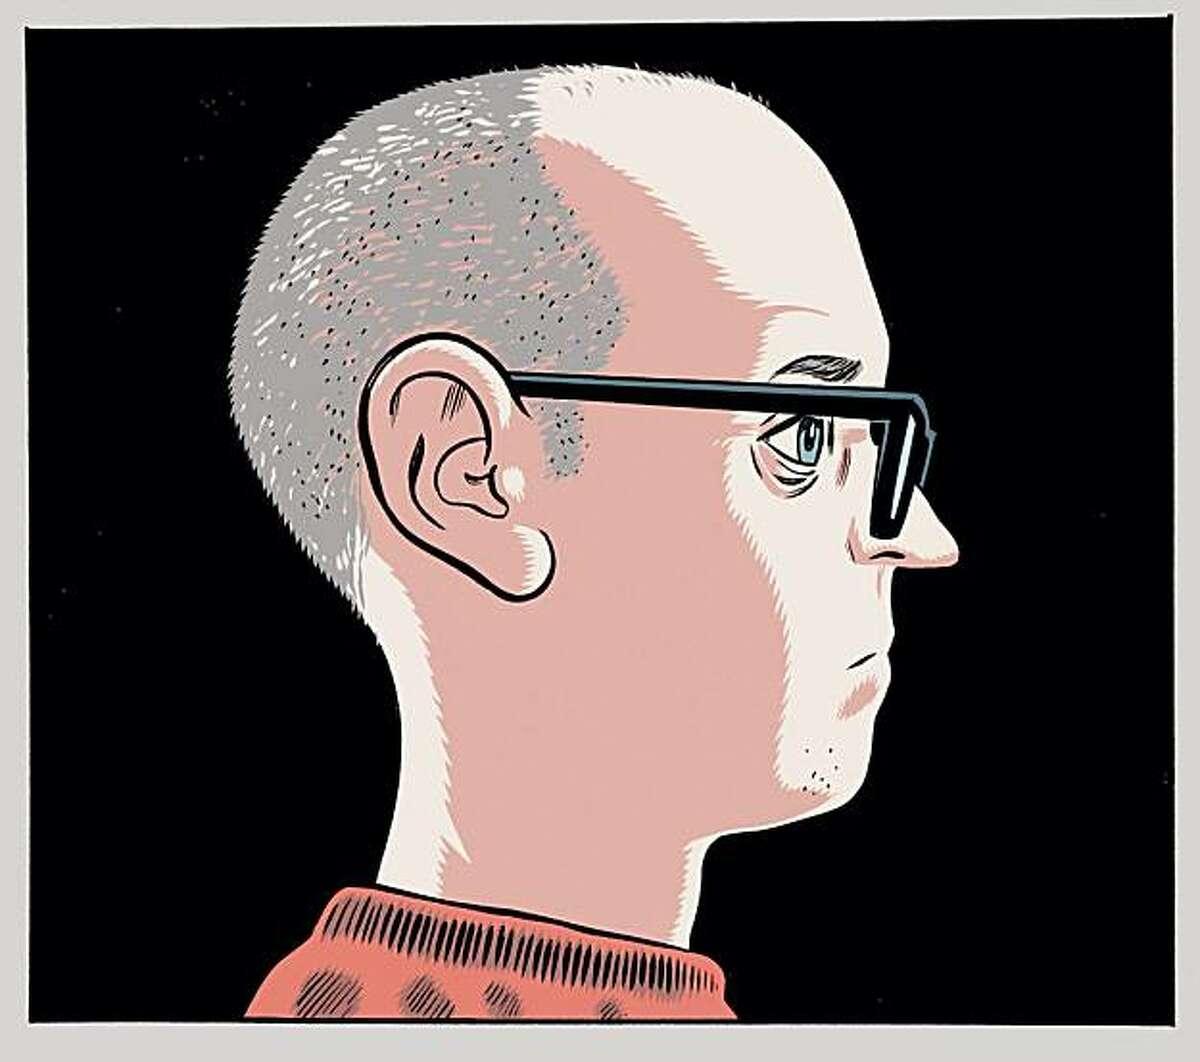 Daniel Clowes self-portrait.